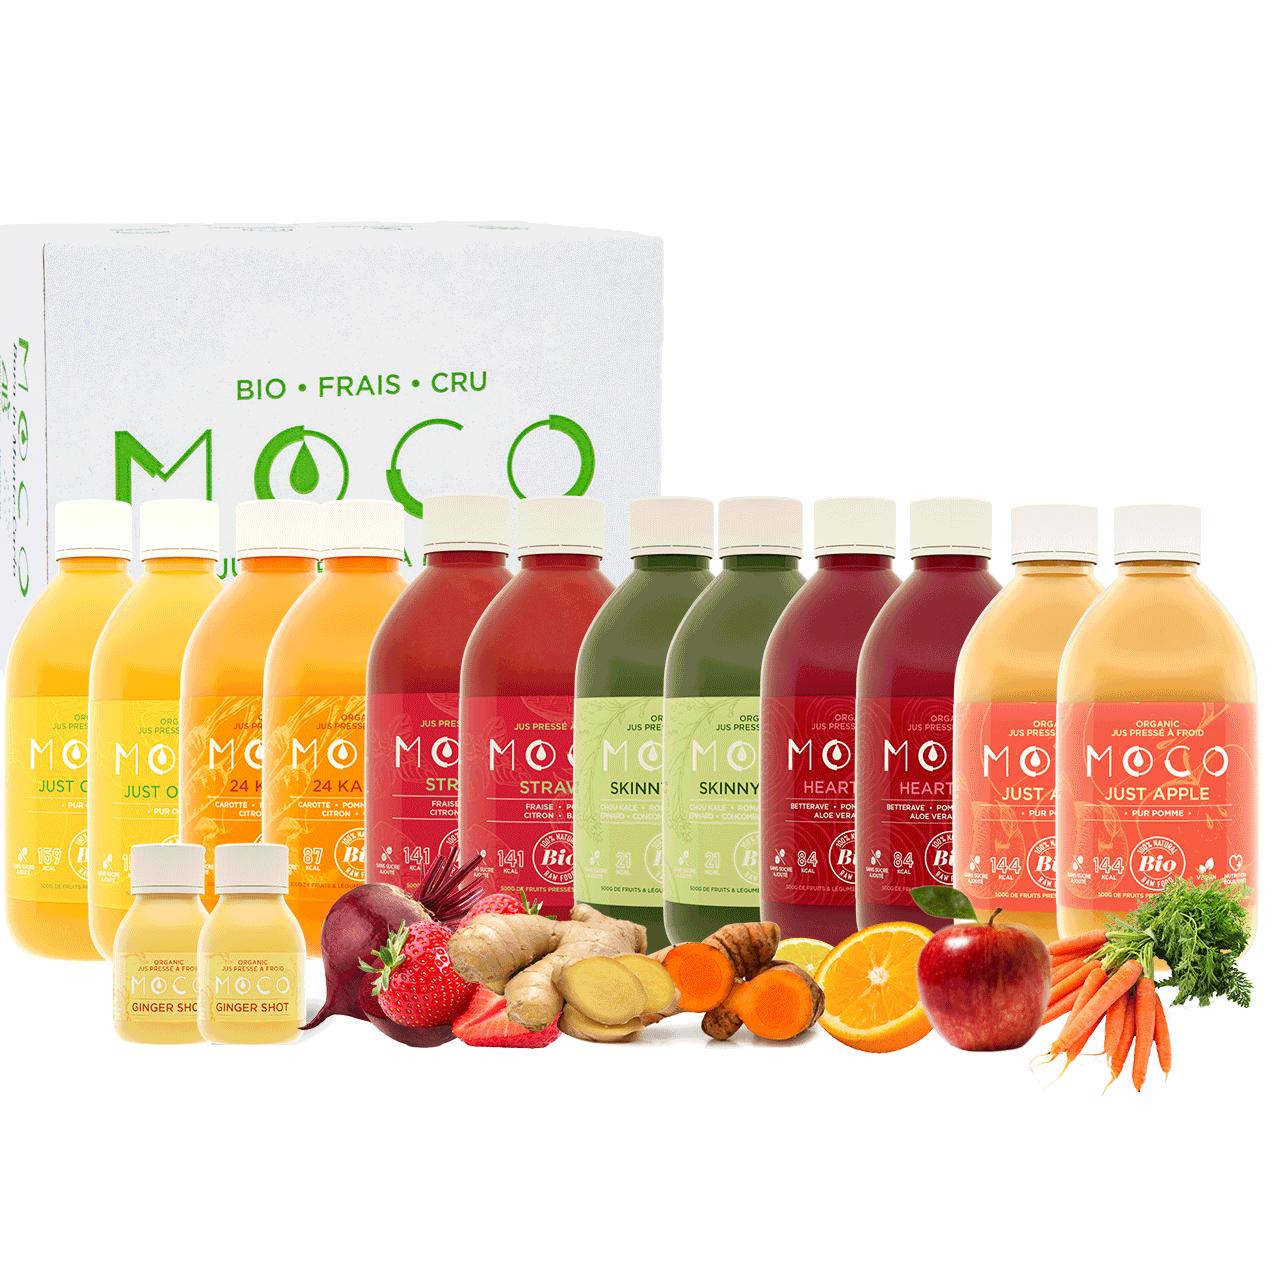 Beginner Cleanes juice pack content